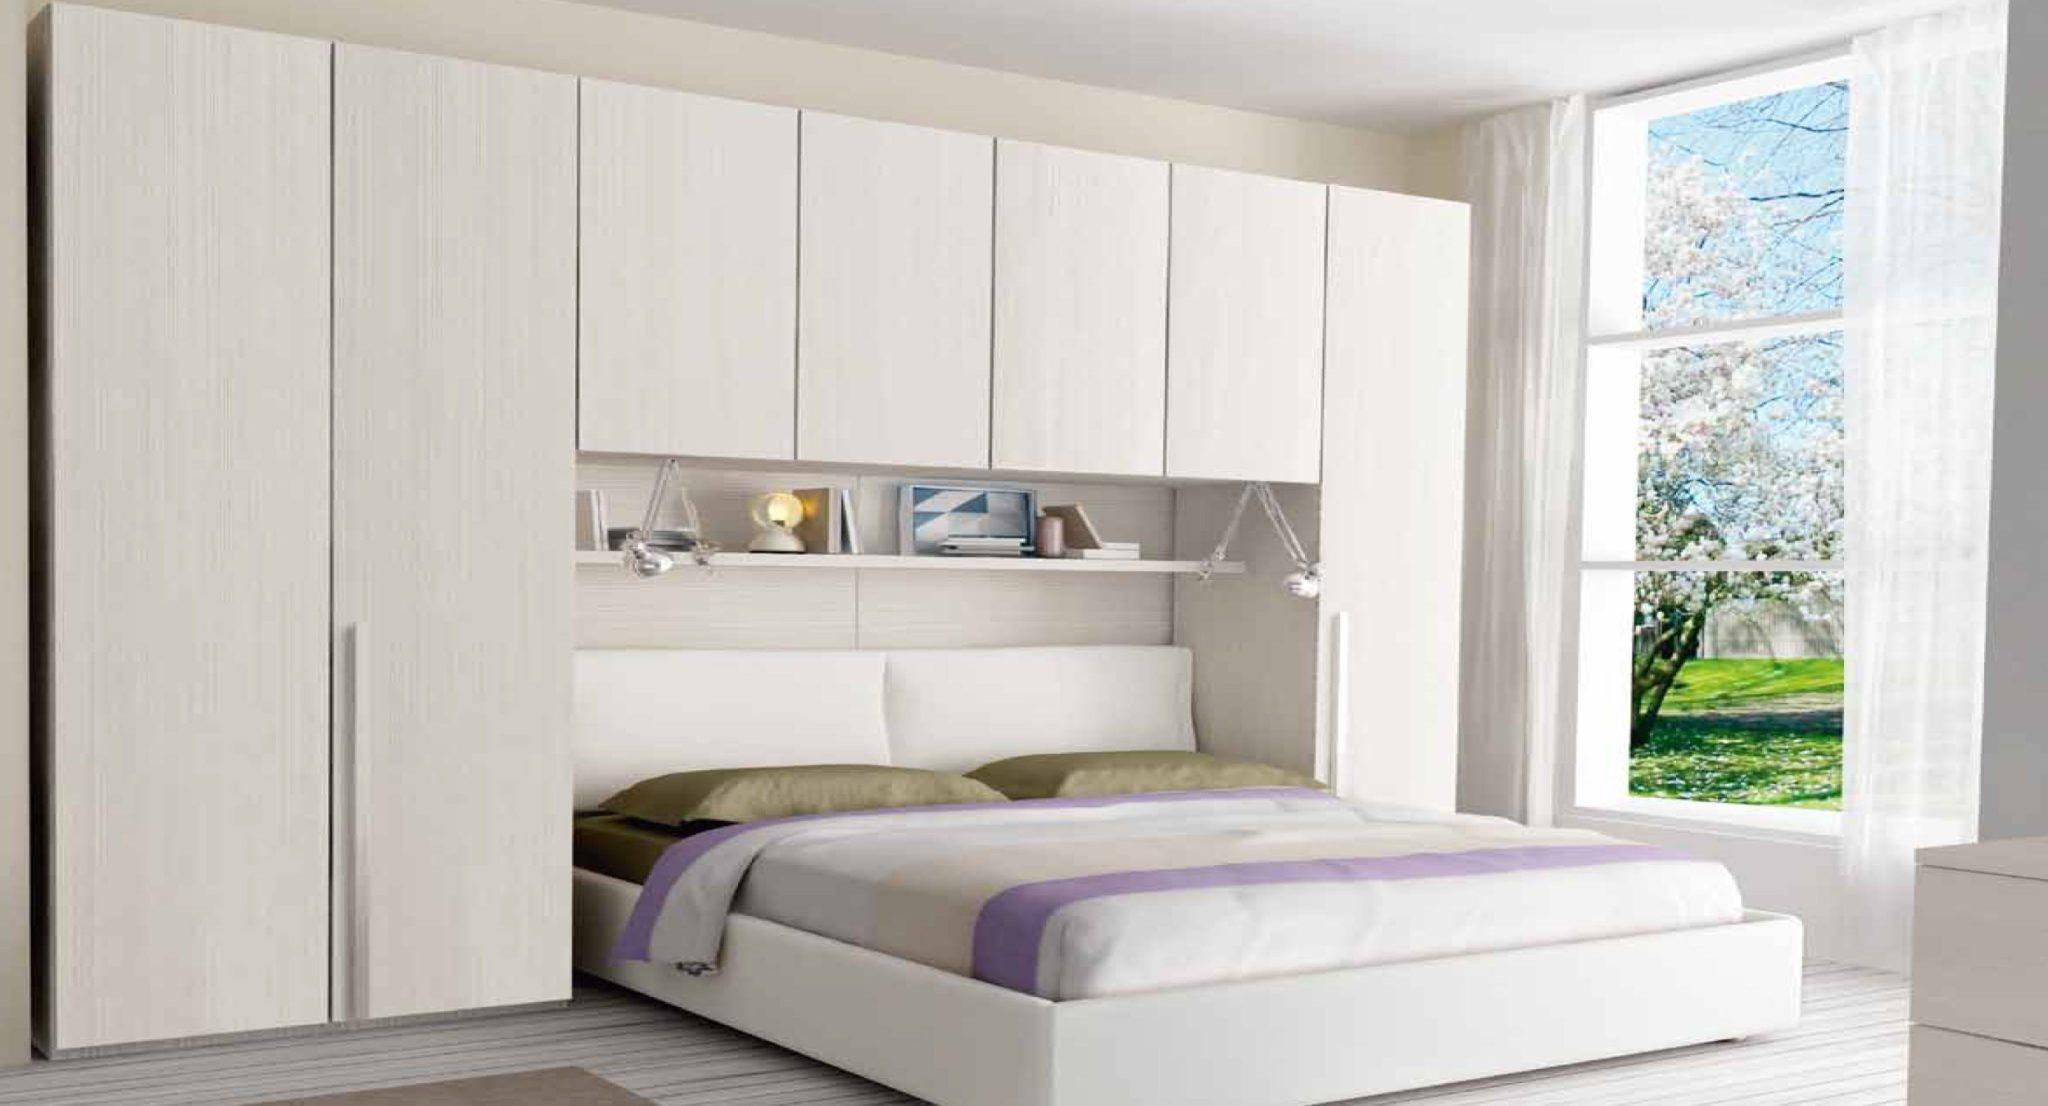 favori dressing autour du lit en36 montrealeast. Black Bedroom Furniture Sets. Home Design Ideas